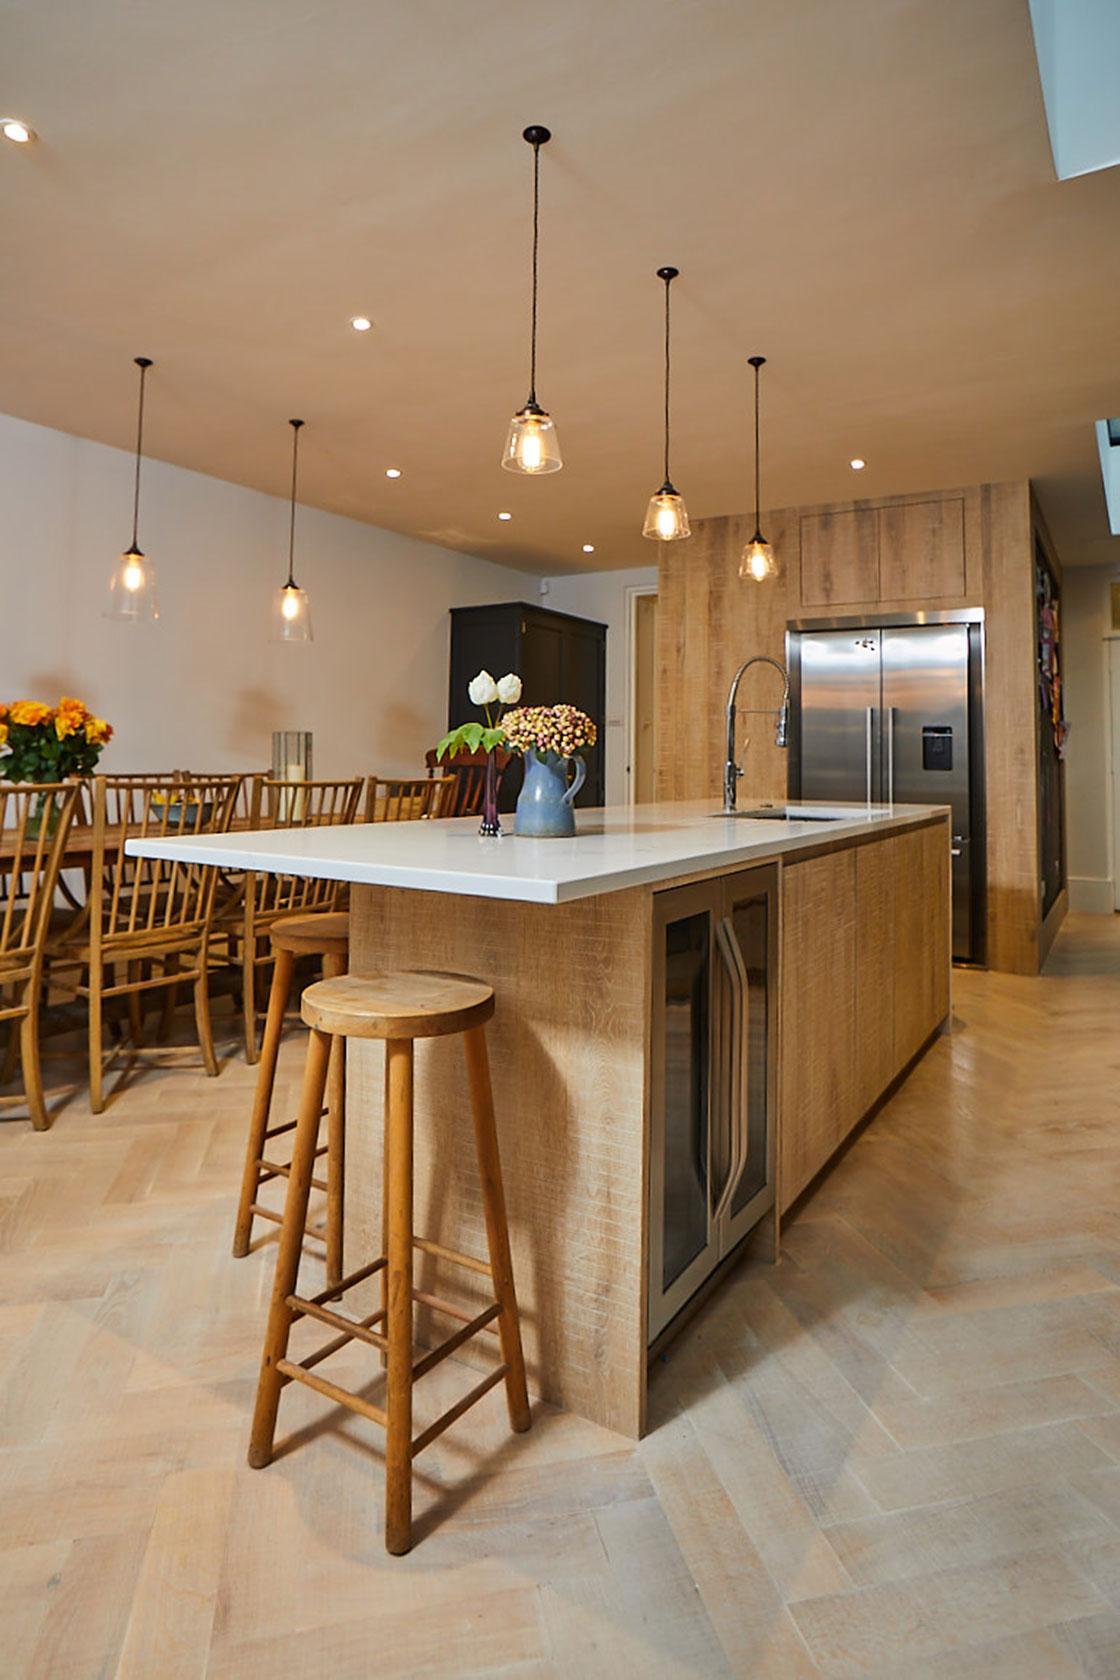 Oak breakfast bar stool sits under white Caesarstone worktop